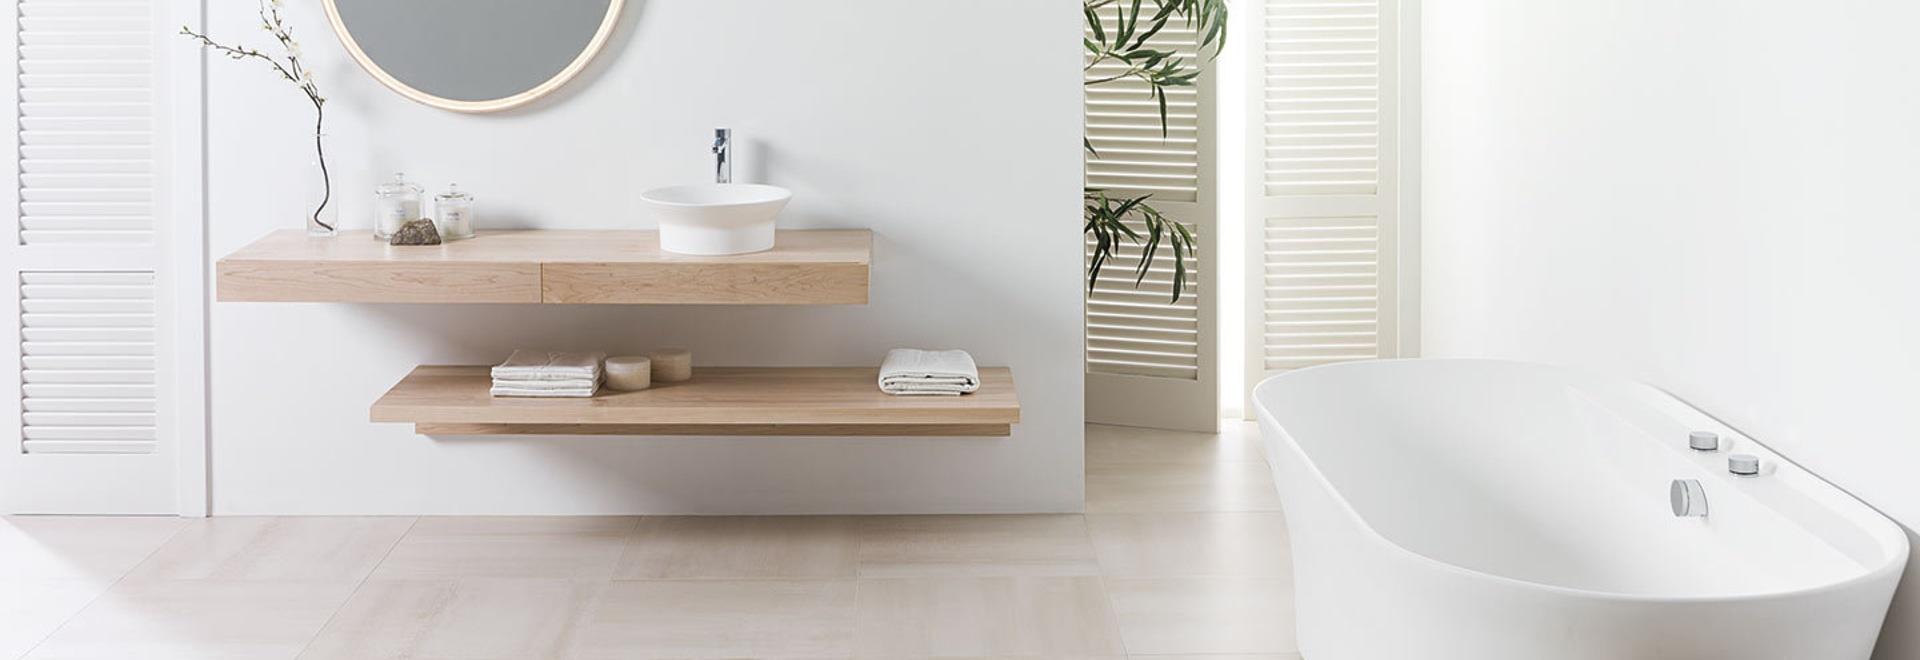 sanitärobjekte im badezimmer im Überblick. uncategorized : 8 ...